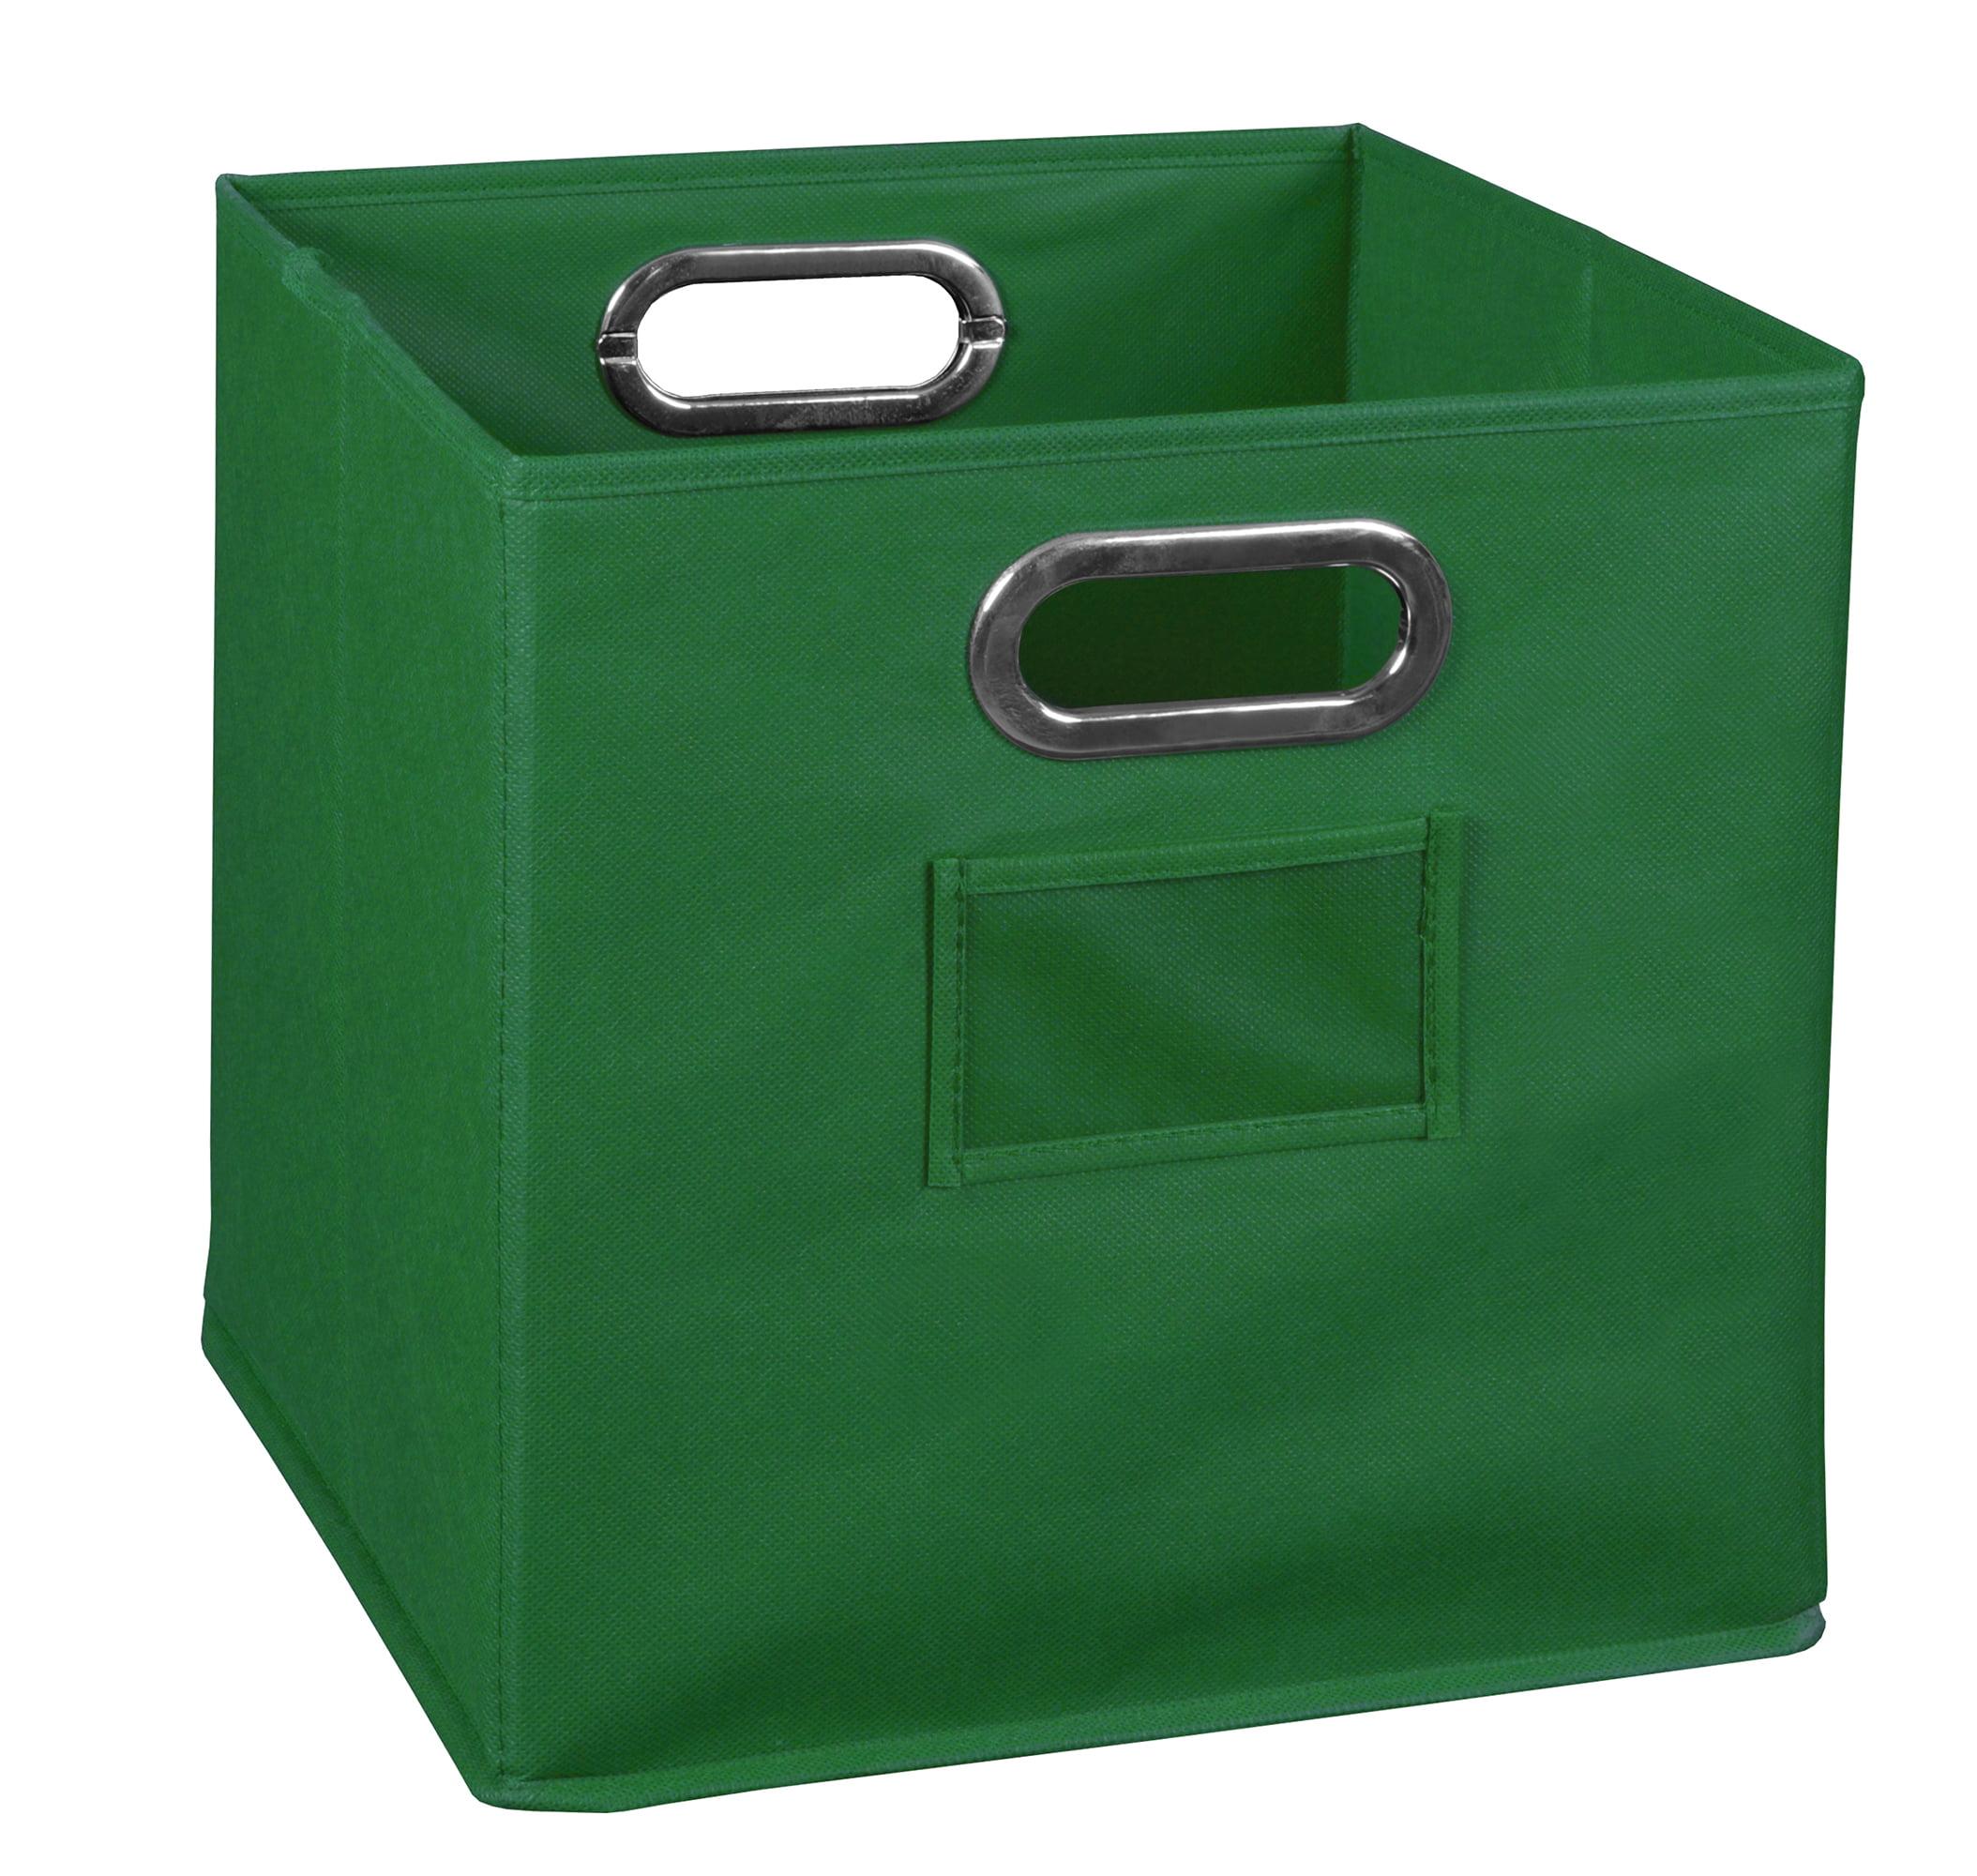 Niche Cubo Foldable Fabric Storage Bin- Teal